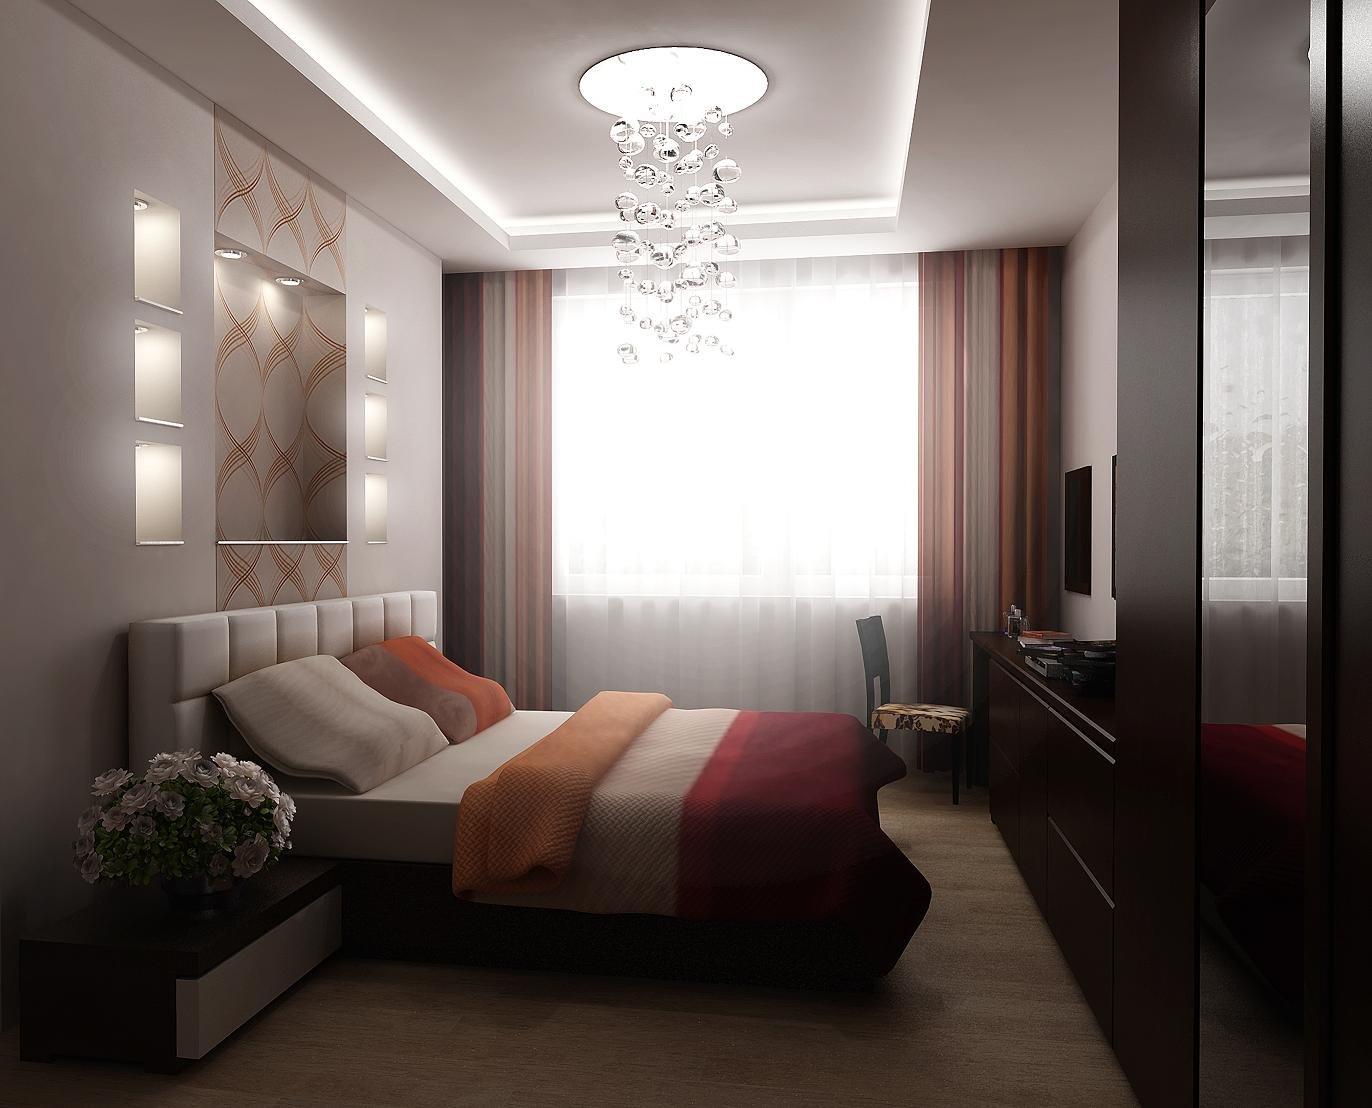 дизайн узких комнат фото стрижка для